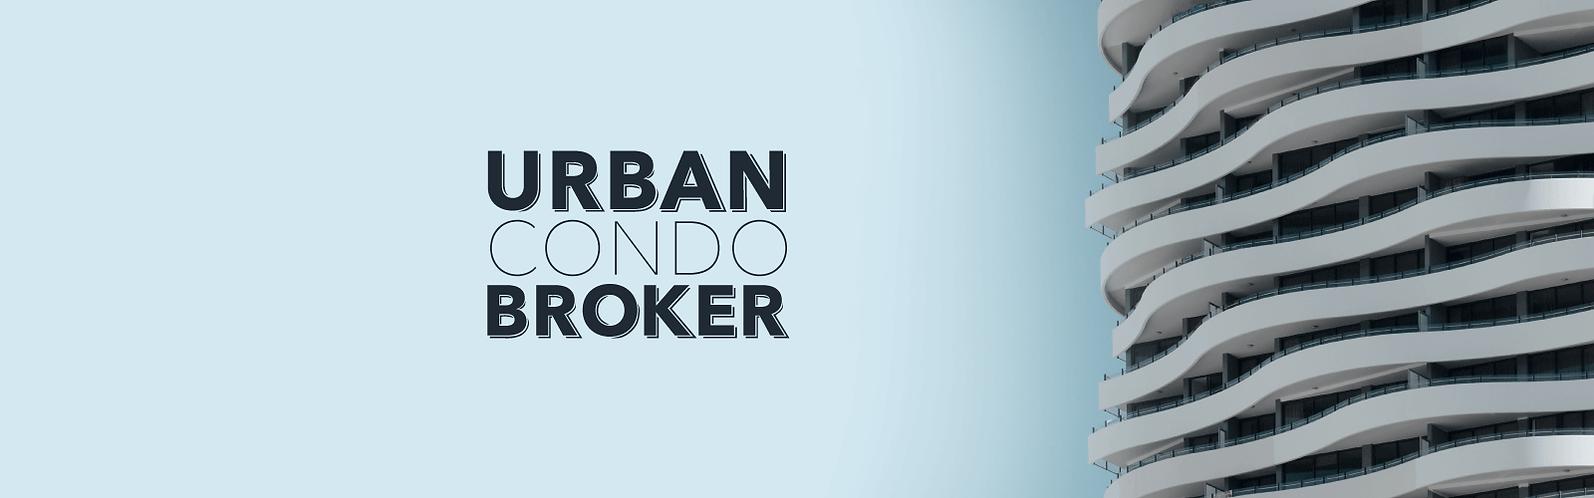 Urban condo broker design